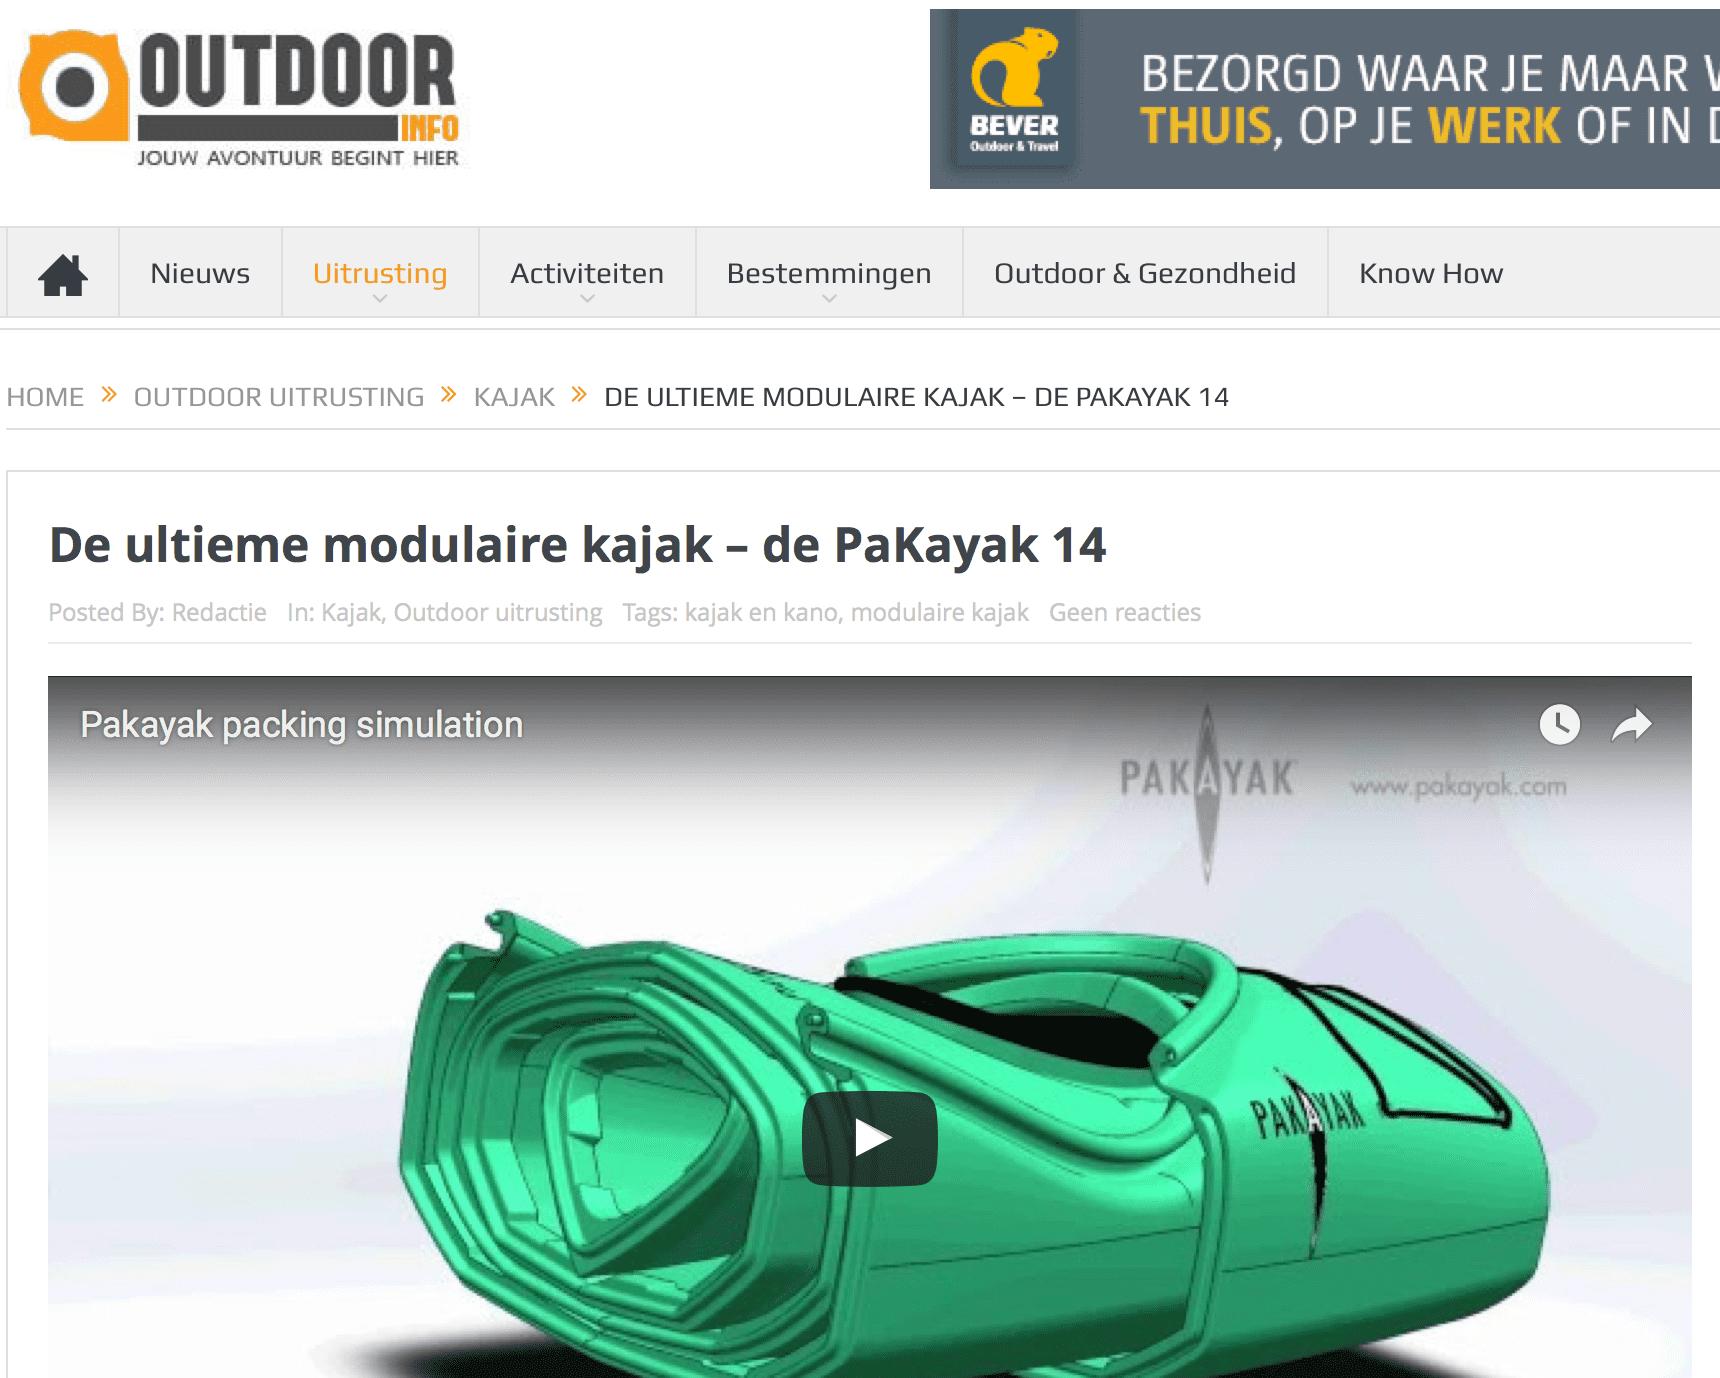 Outdoorinfo.nl: De ultieme modulaire kajak – de PaKayak 14